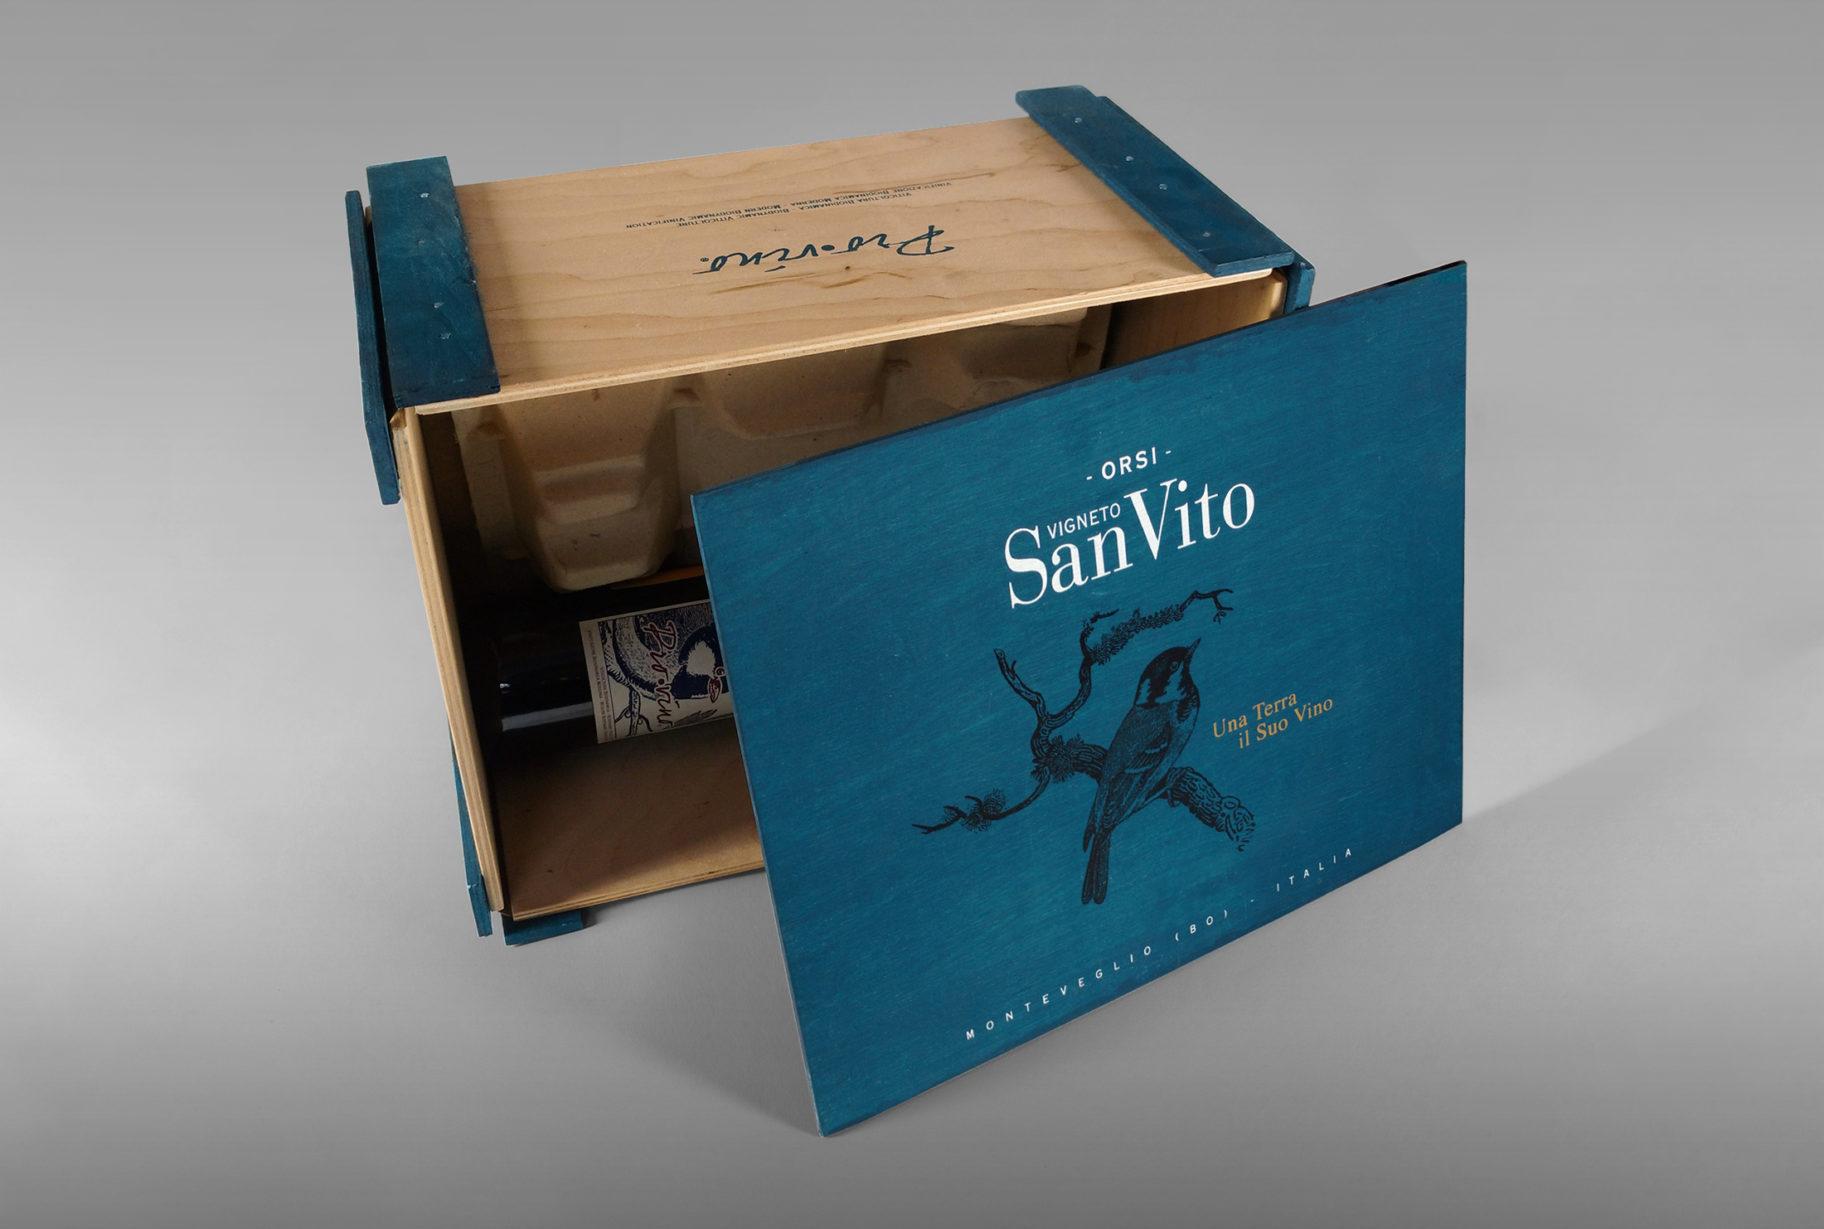 ORSI-Vigneto-SanVito-cassetta-packaging